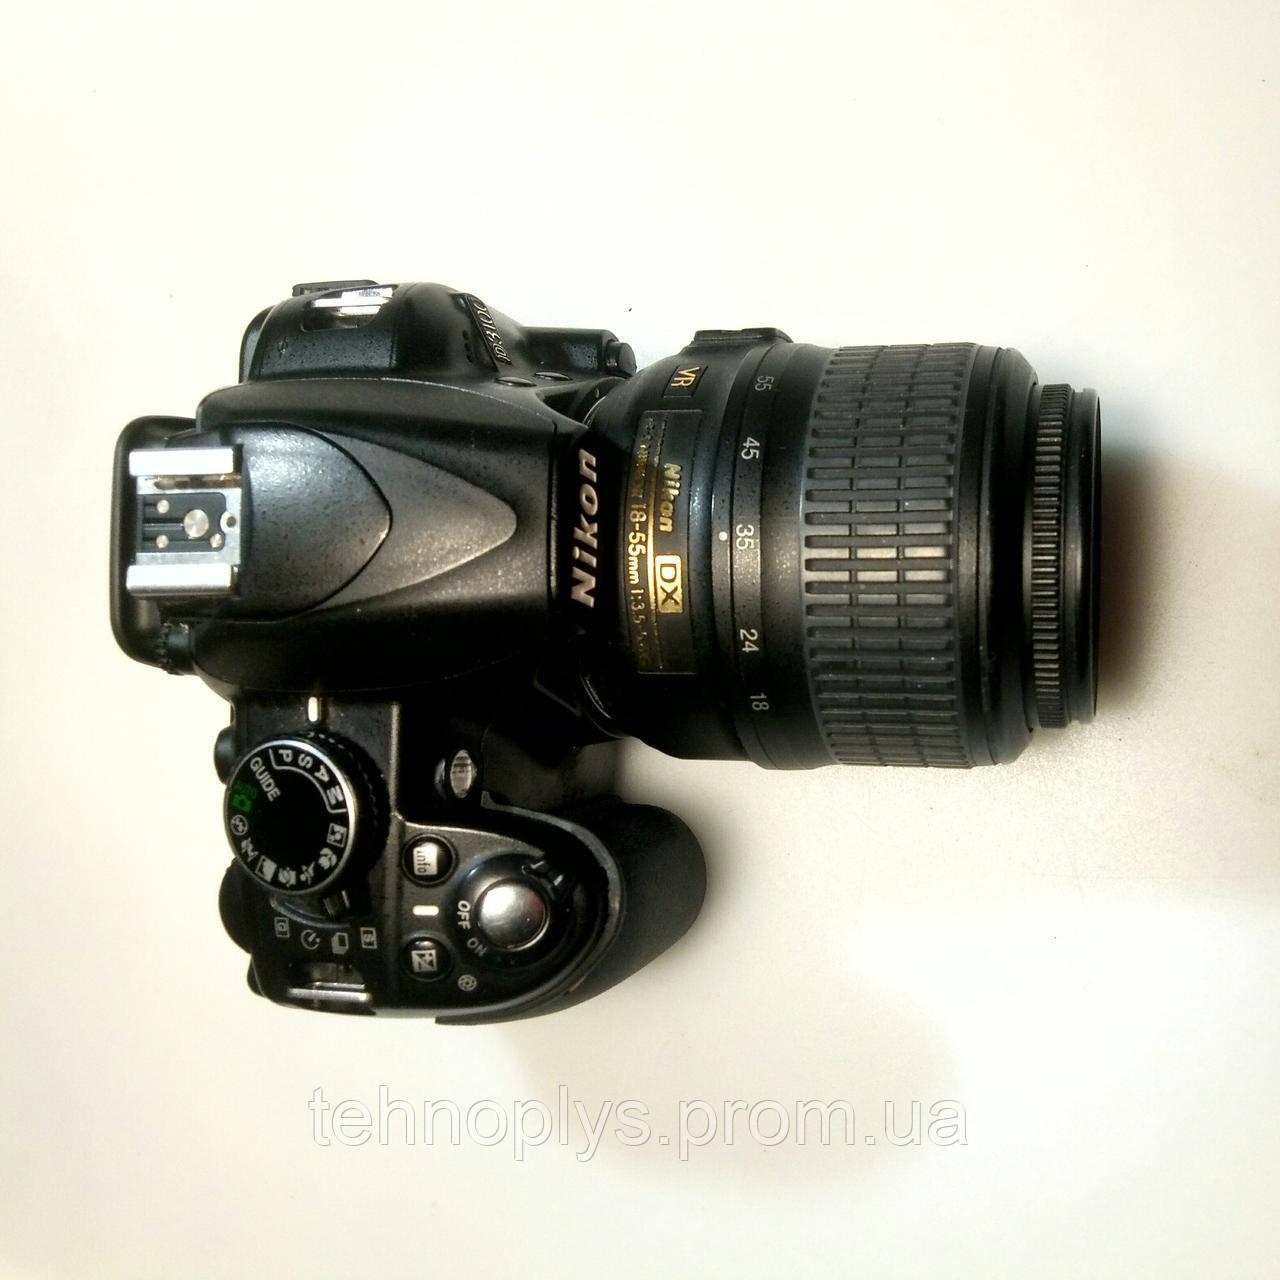 Ремонт Nikon, Canon, Fuji, Panasonic